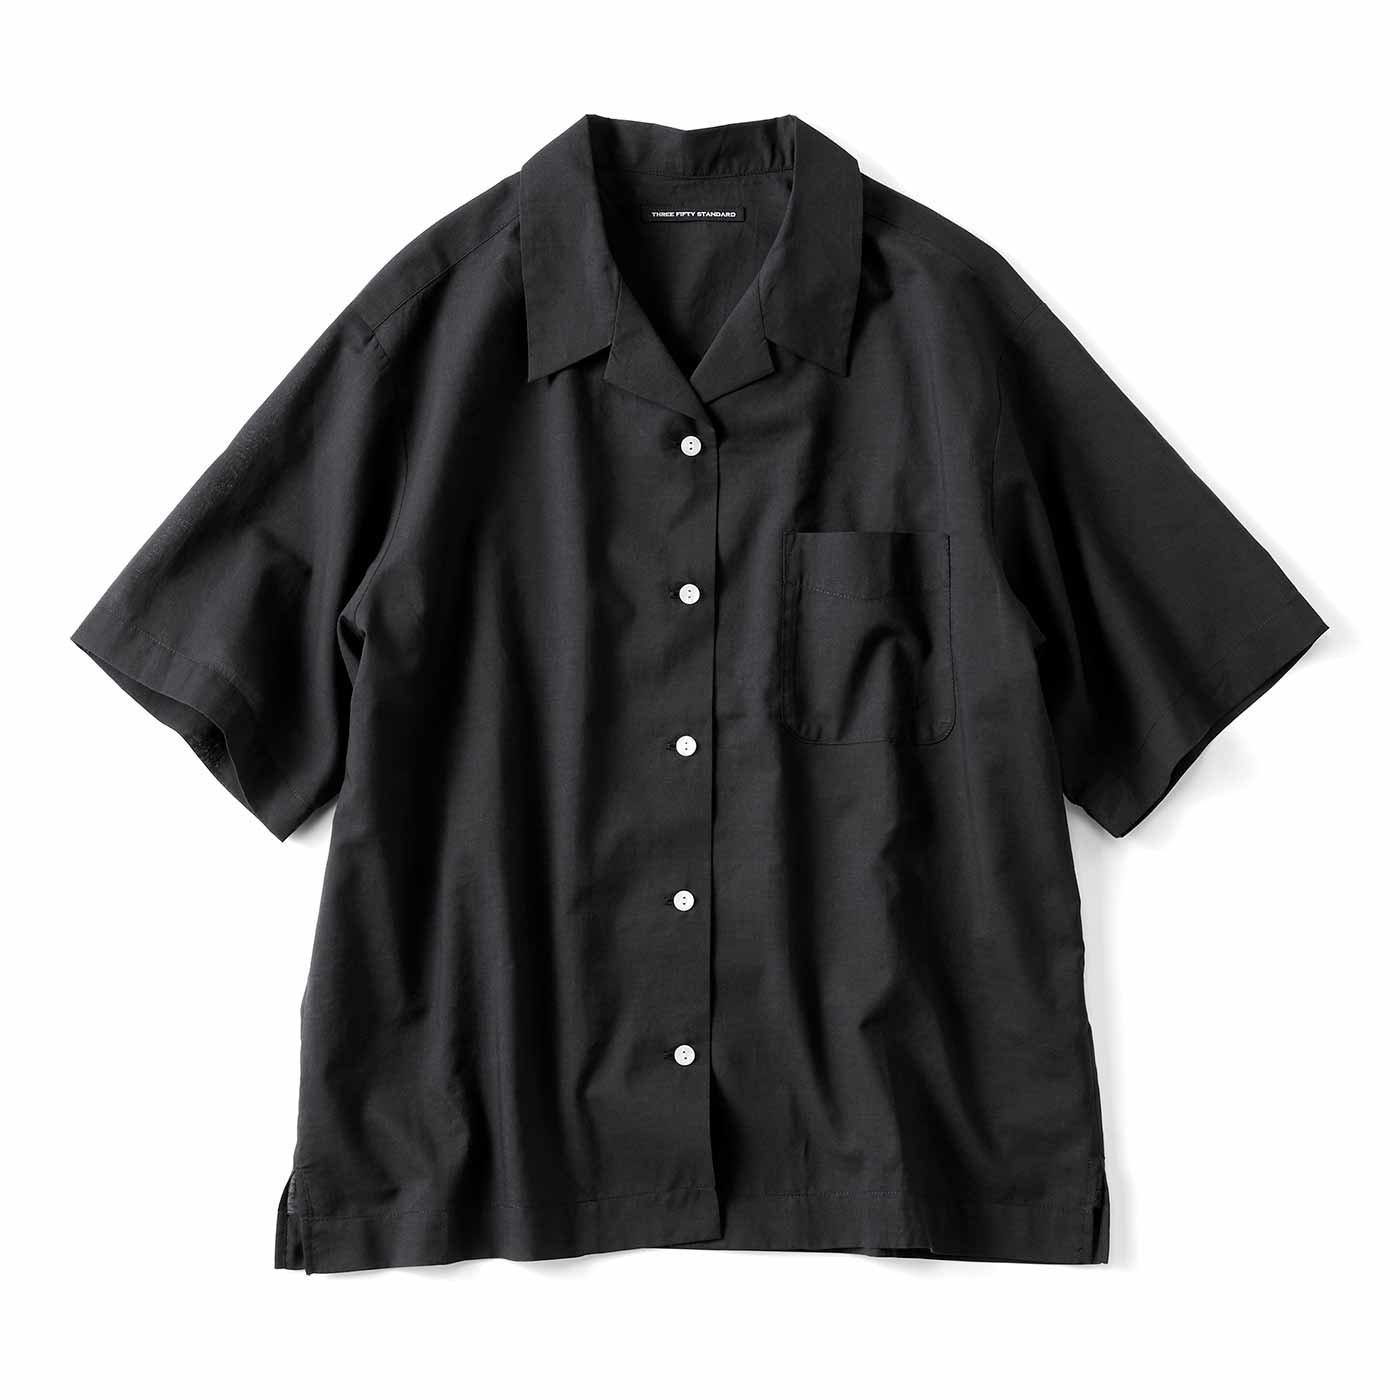 THREE FIFTY STANDARD さらっとシルク混の開衿シャツ〈ブラック〉